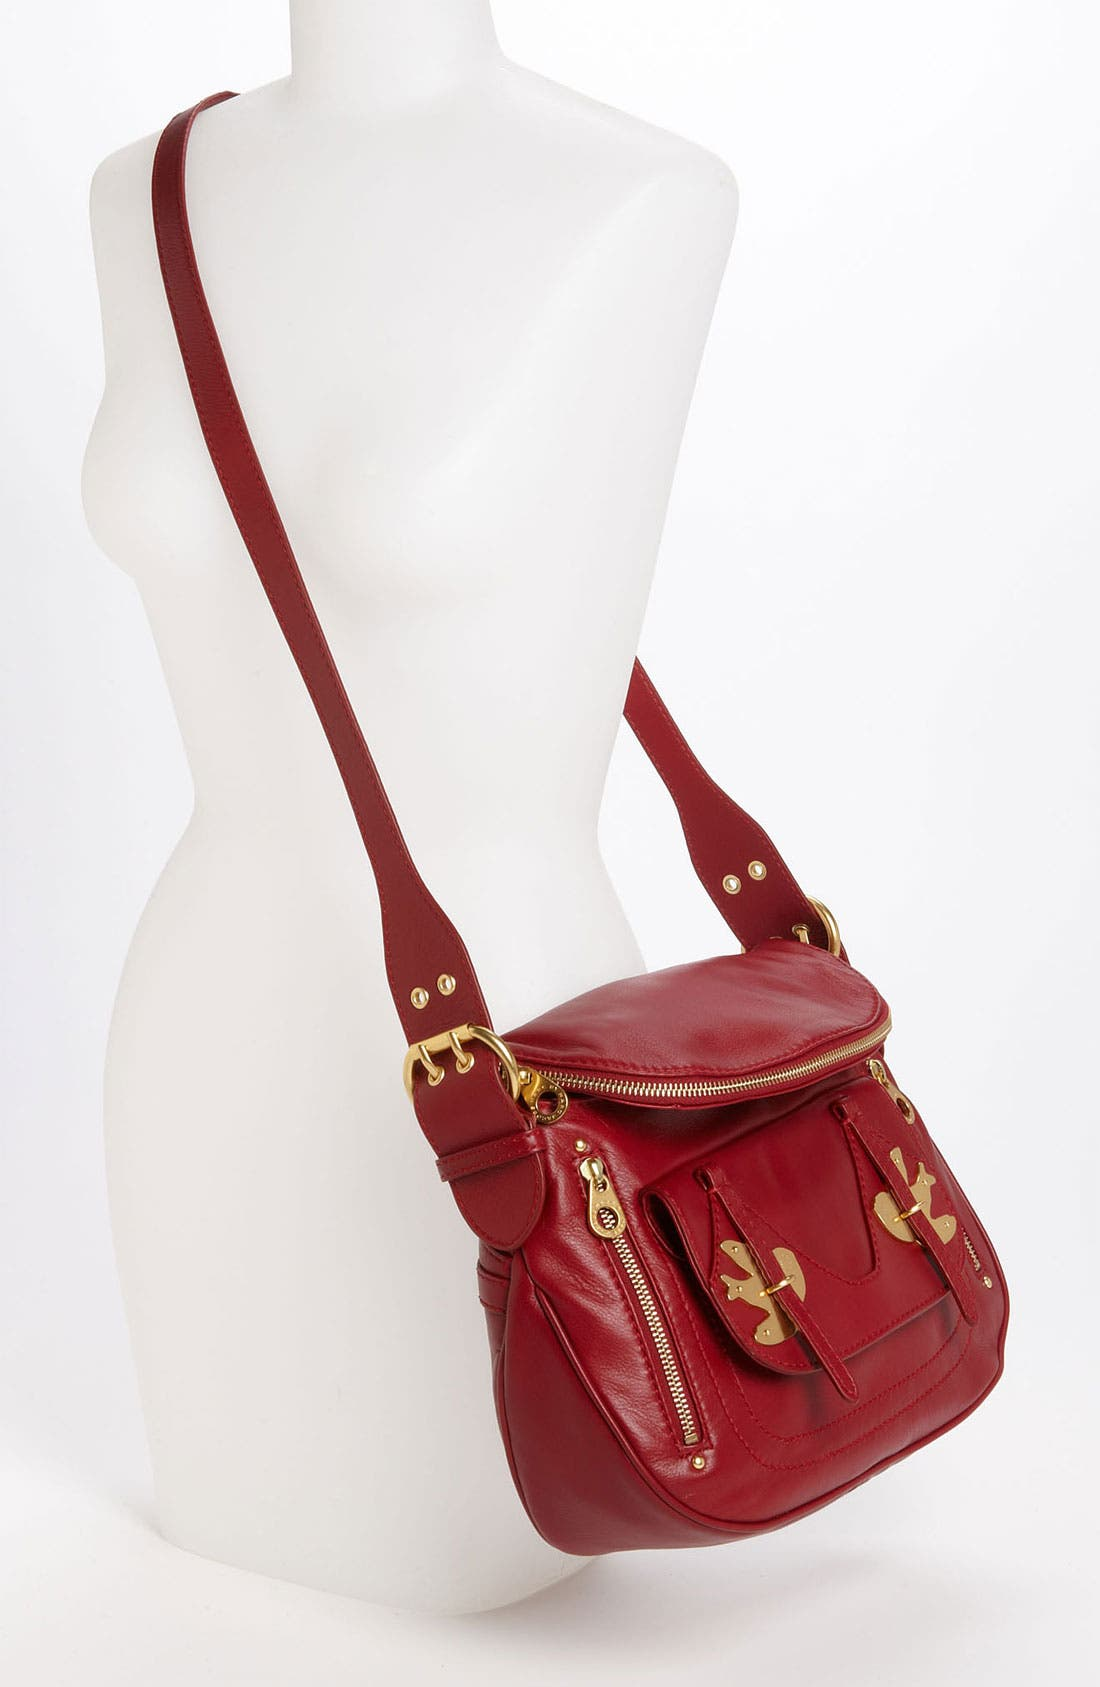 ,                             MARC BY MARC JACOBS 'Petal to the Metal - Natasha' Flap Crossbody Bag, Medium,                             Alternate thumbnail 38, color,                             608